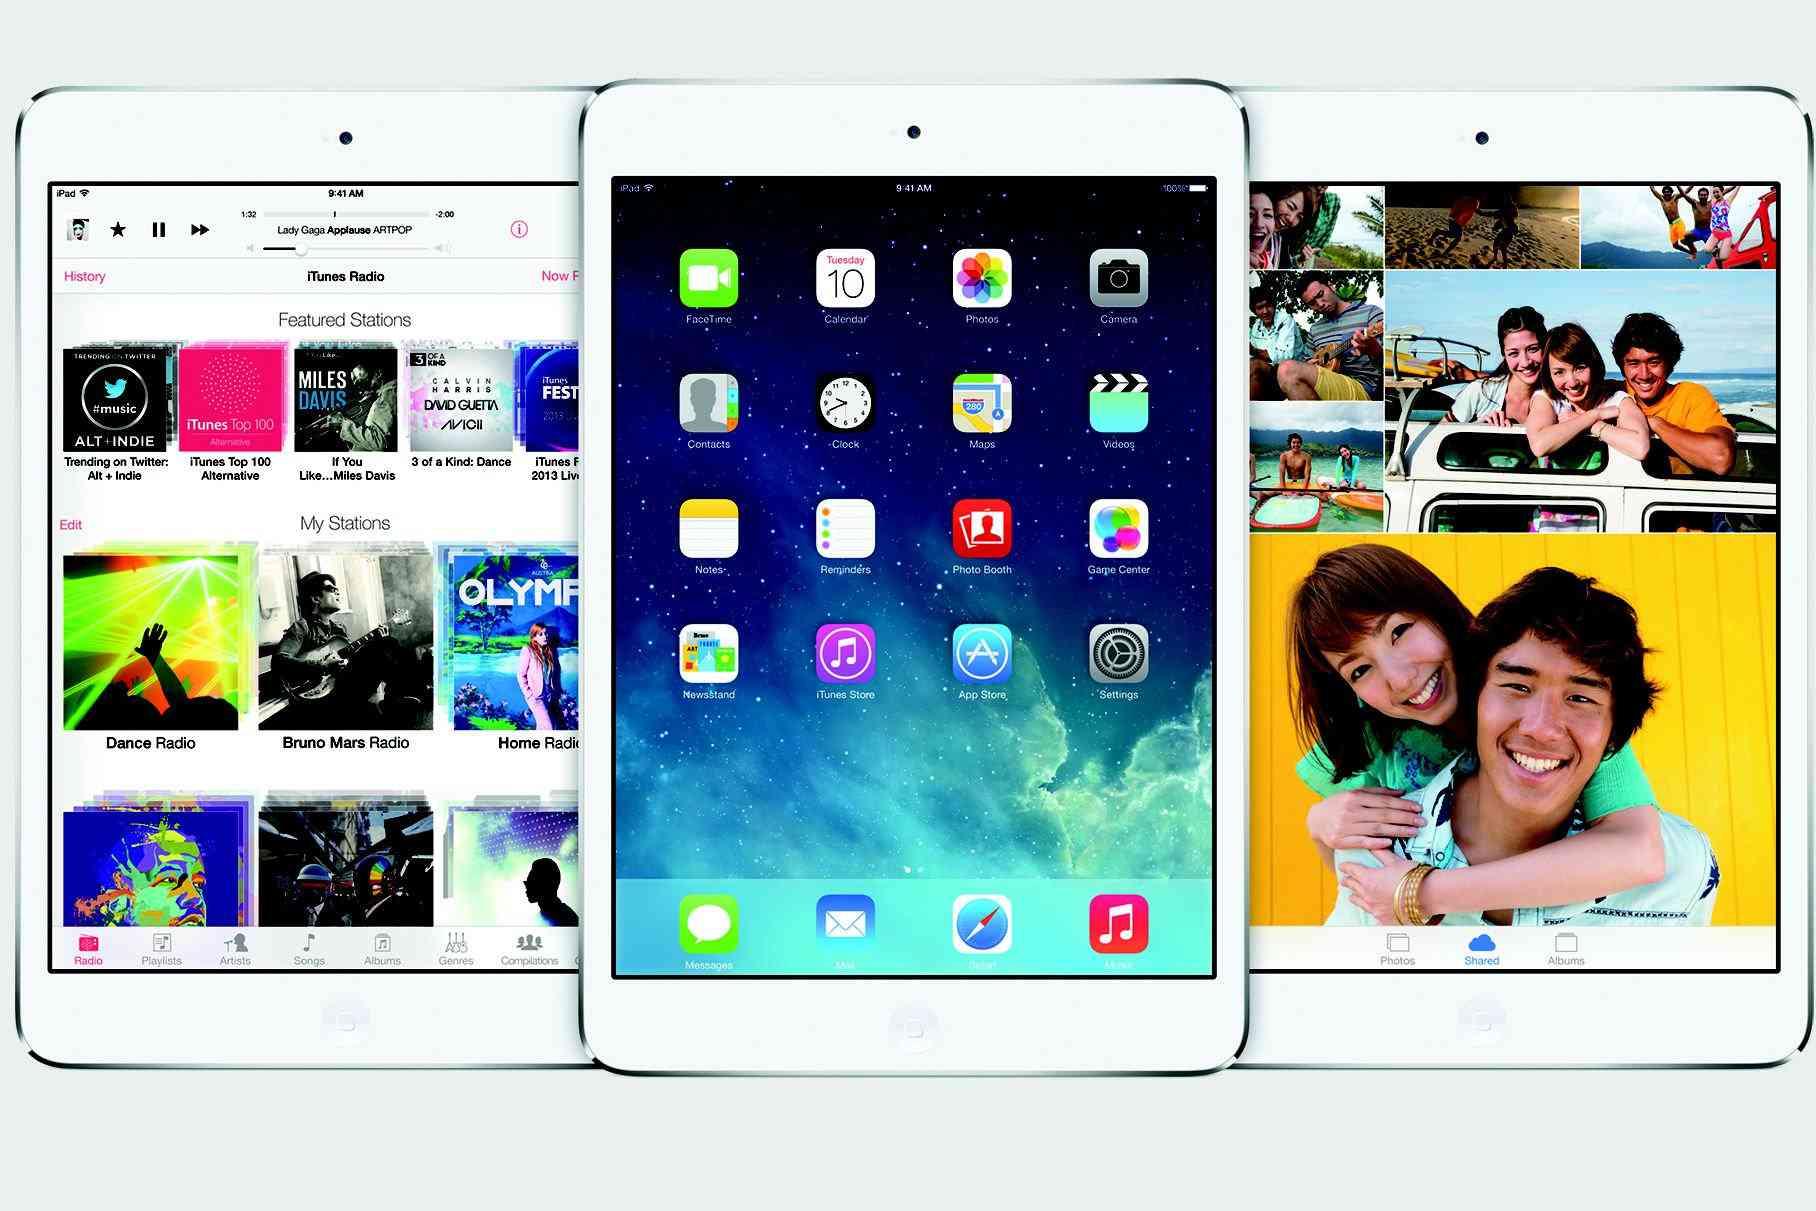 iOS 8 on the iPad mini